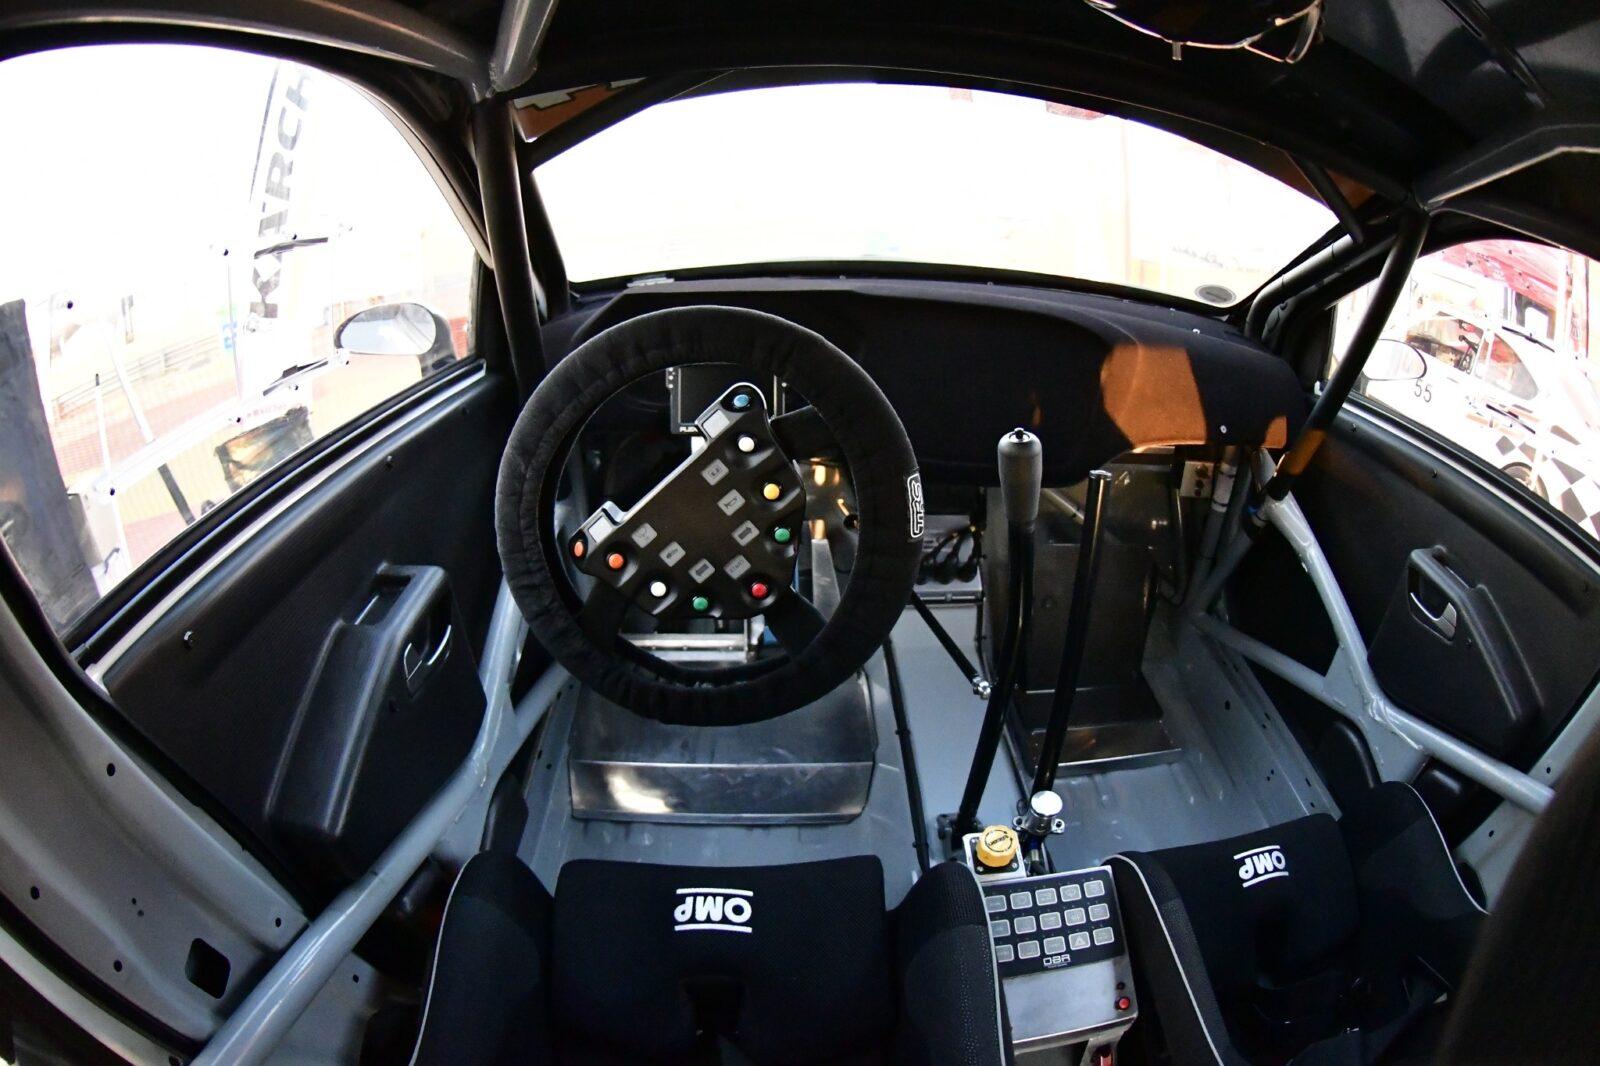 OBR MSP, OBR PCM2 powerbox, OBR SWC can controller, Plex Tuning SDM 550 datalogger, FIA R4 motorpsort electronics supplied by Longman Racing